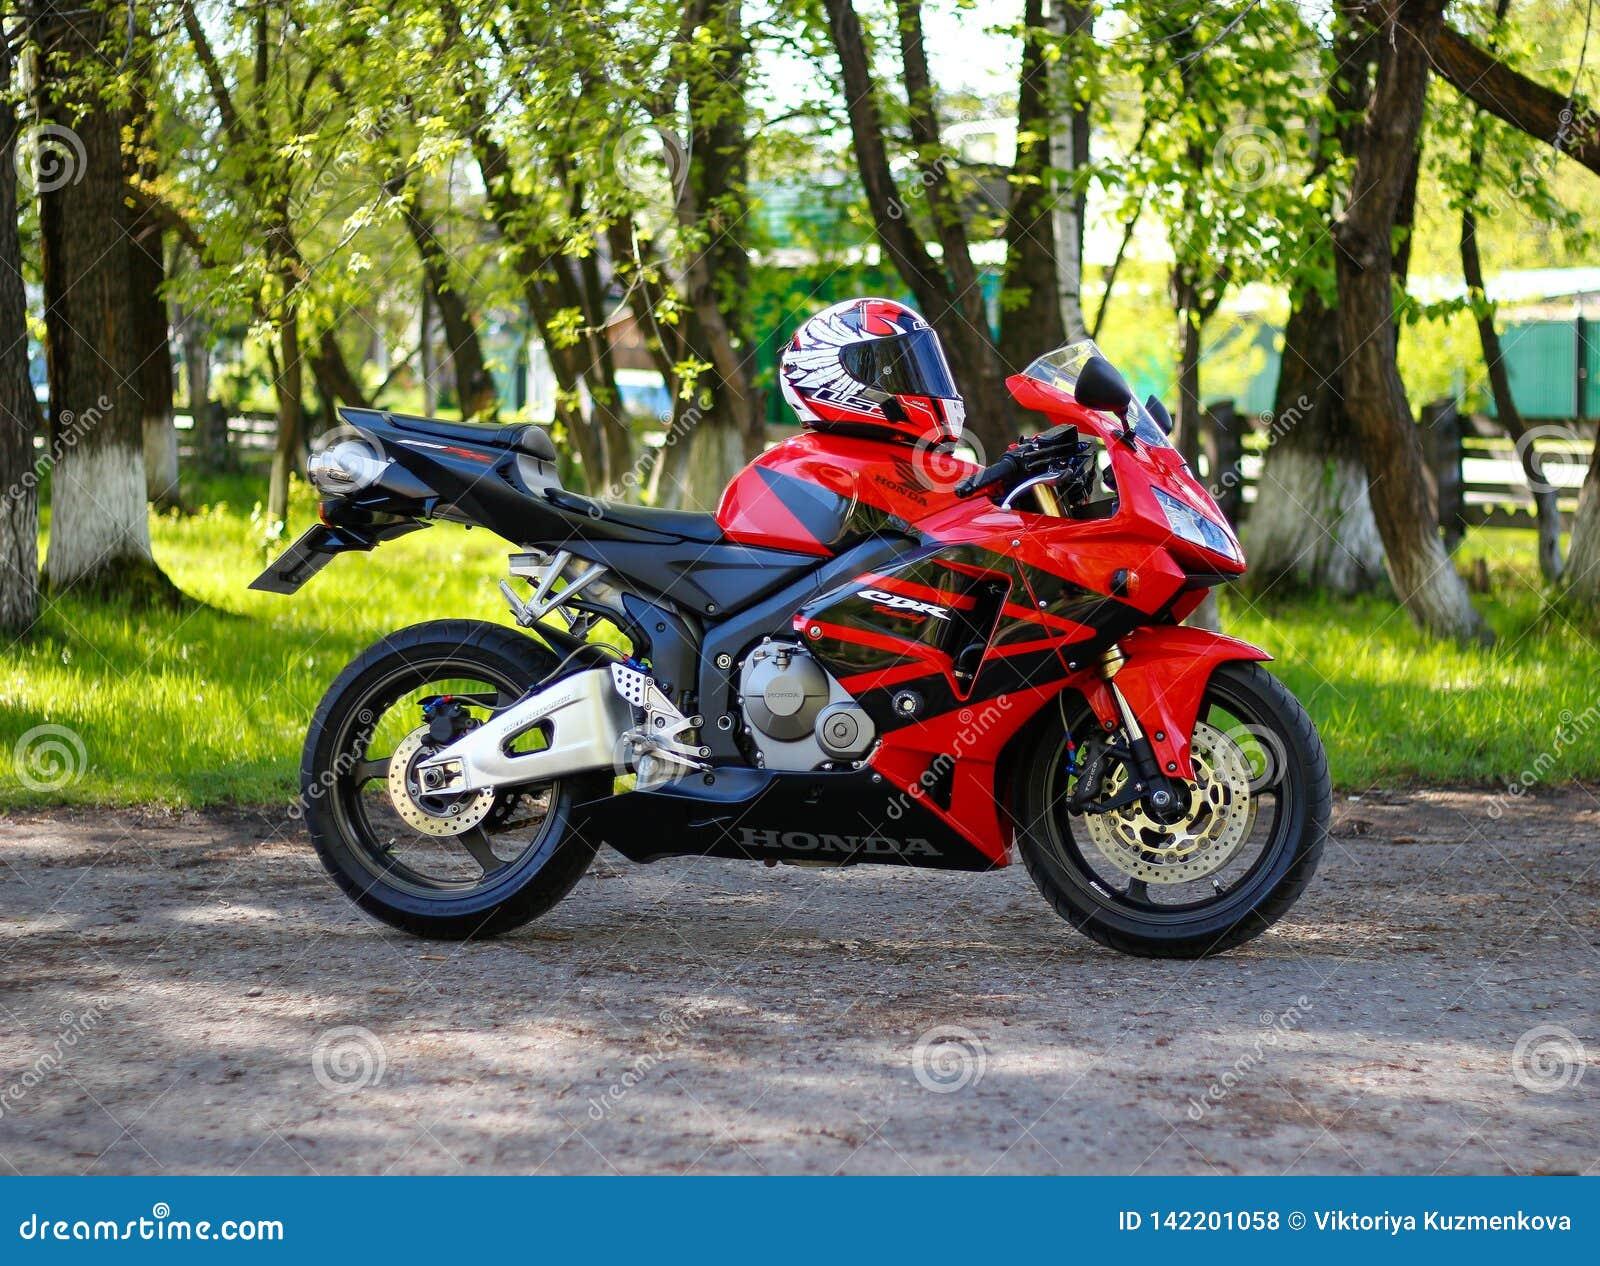 Krasnoyarsk Russia May 25 2018 Red And Black Sportbike Honda